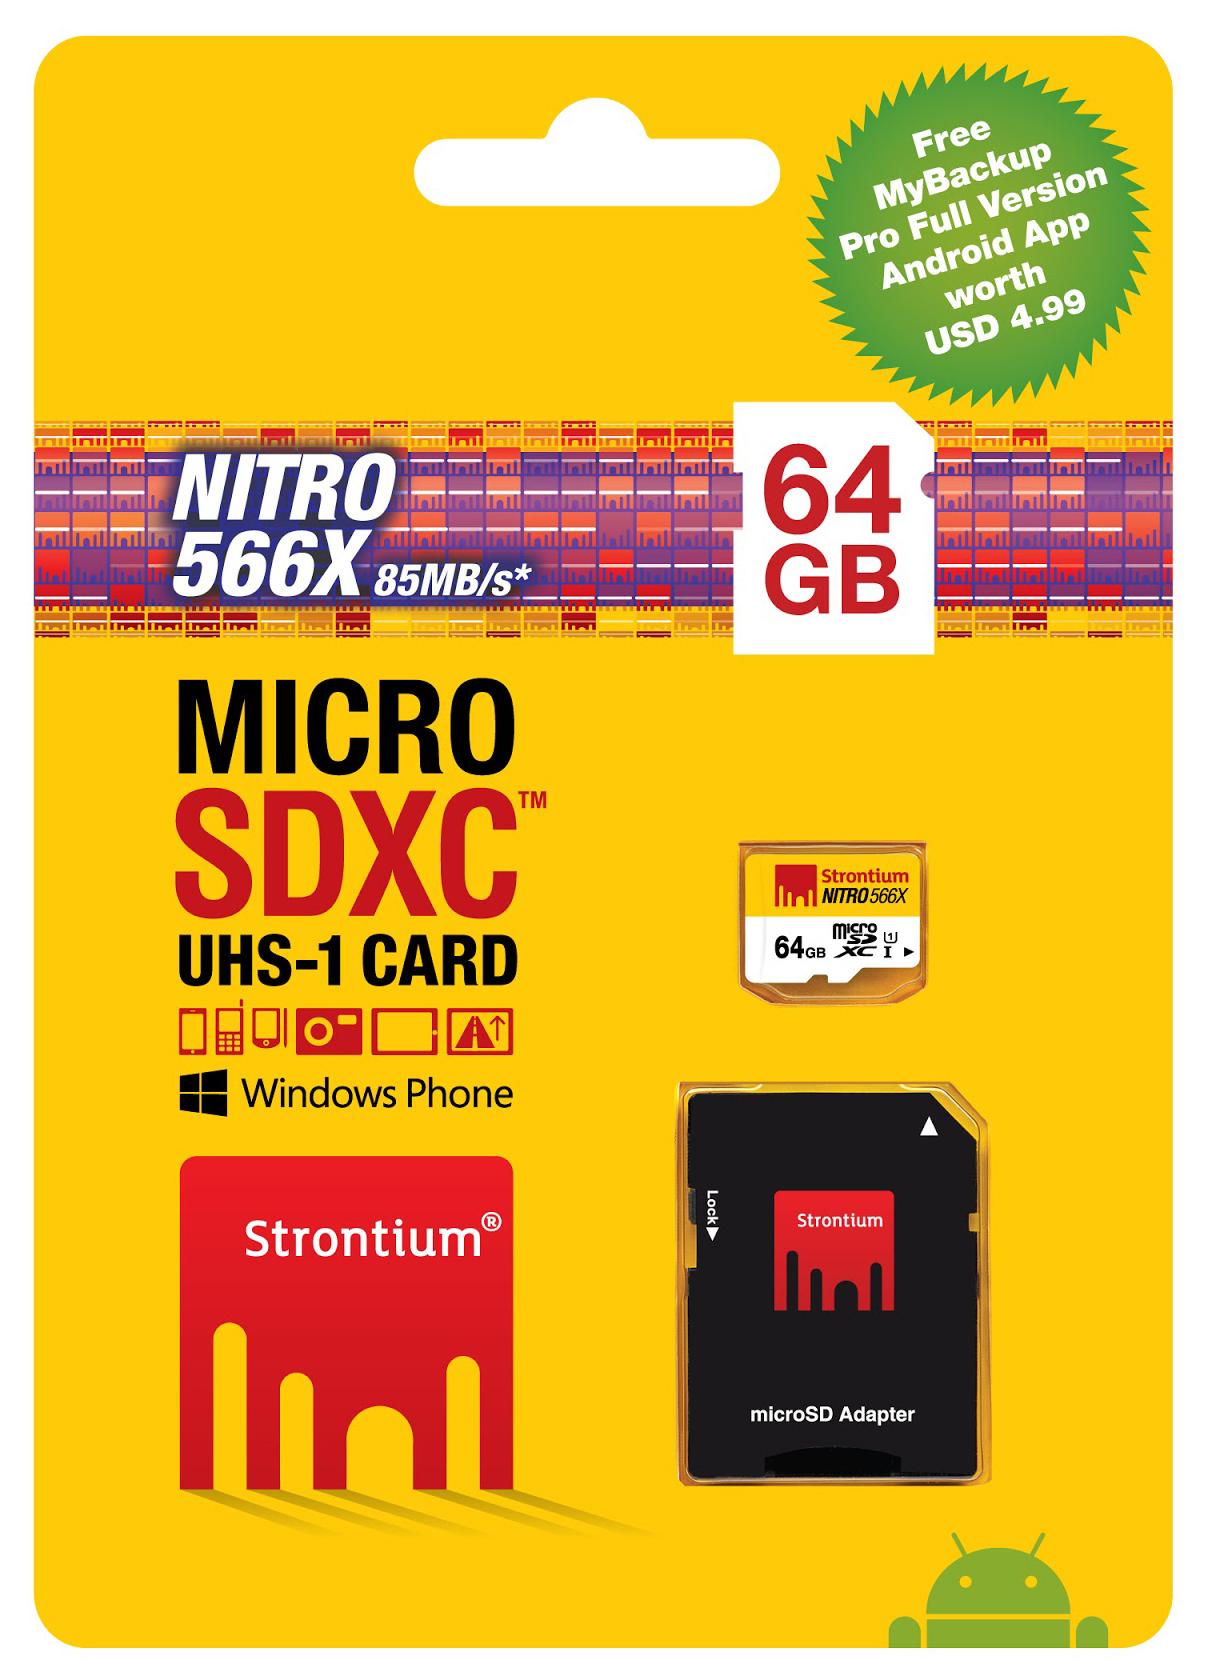 64GB-566X-NITRO-UHS-1-microSD-packaging